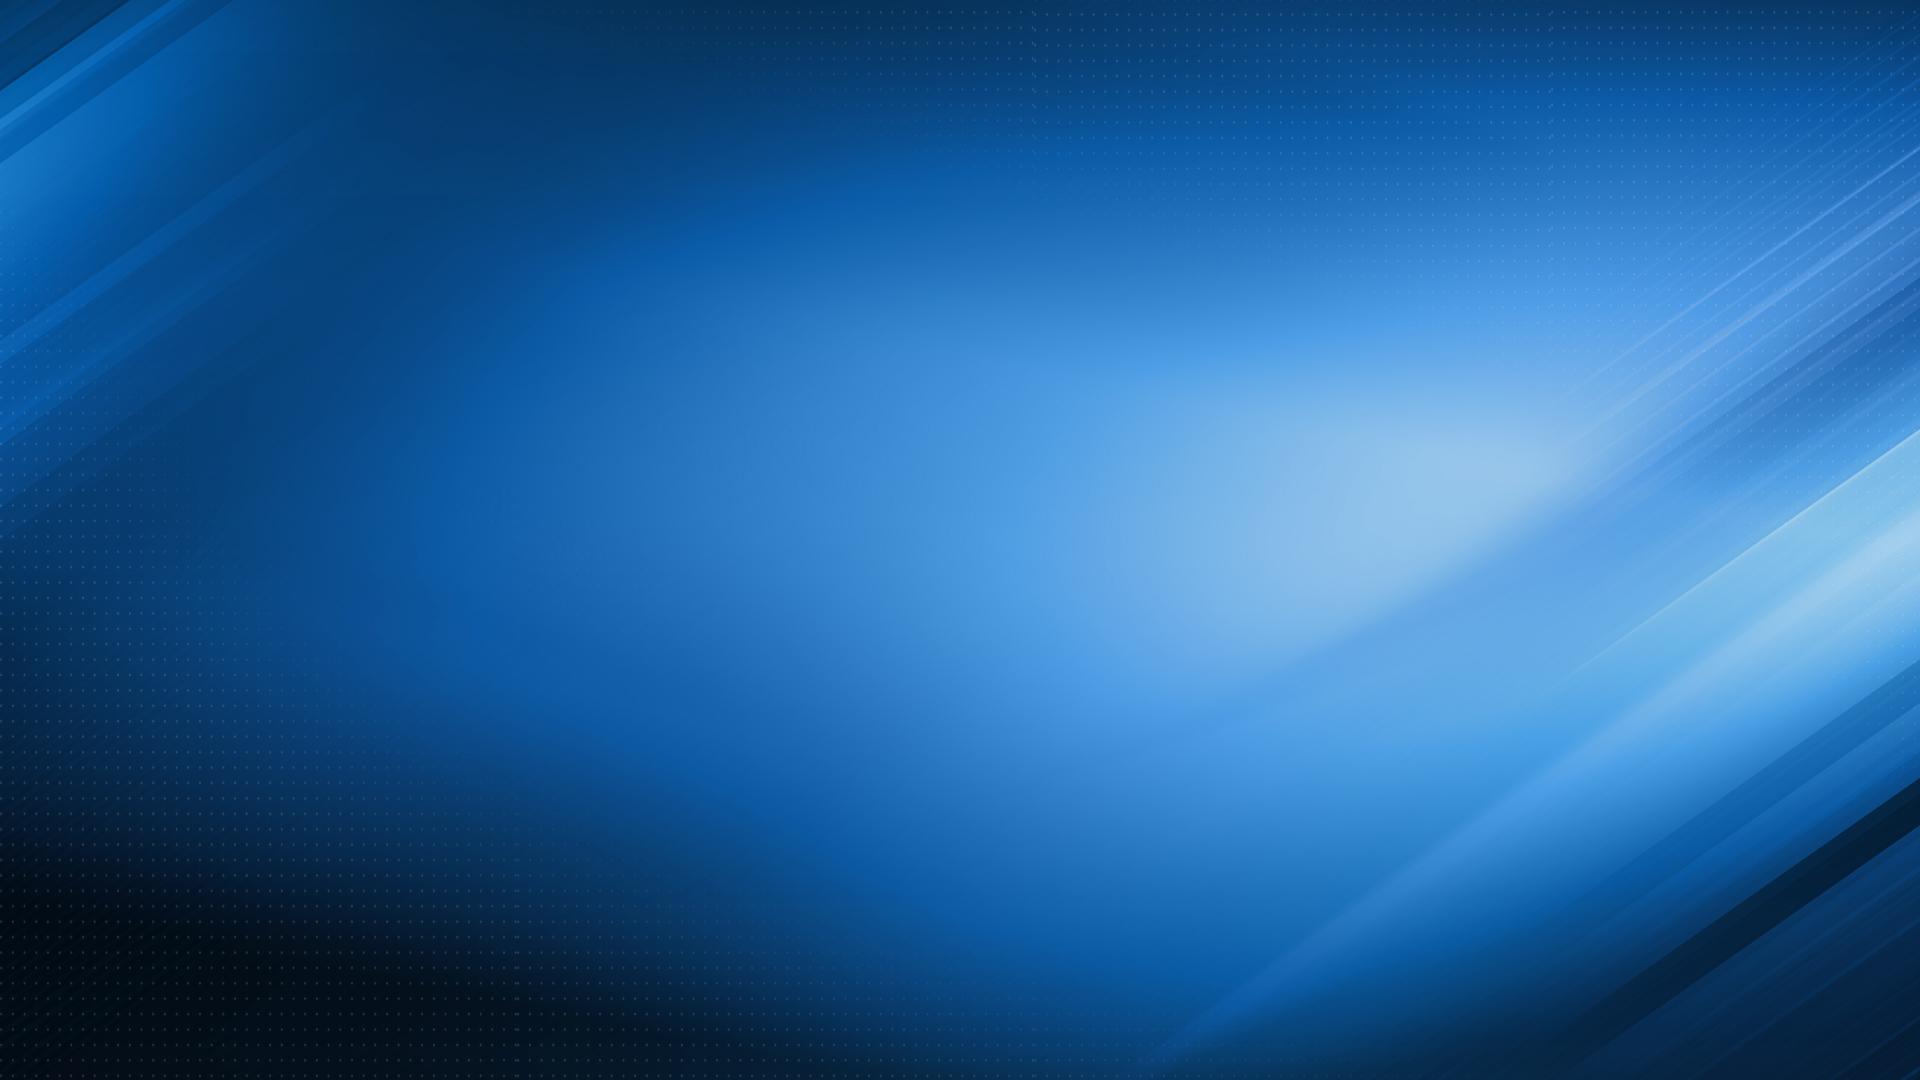 windows 8 wallpaper 1 Windows 8 wallpaper download 1920x1080